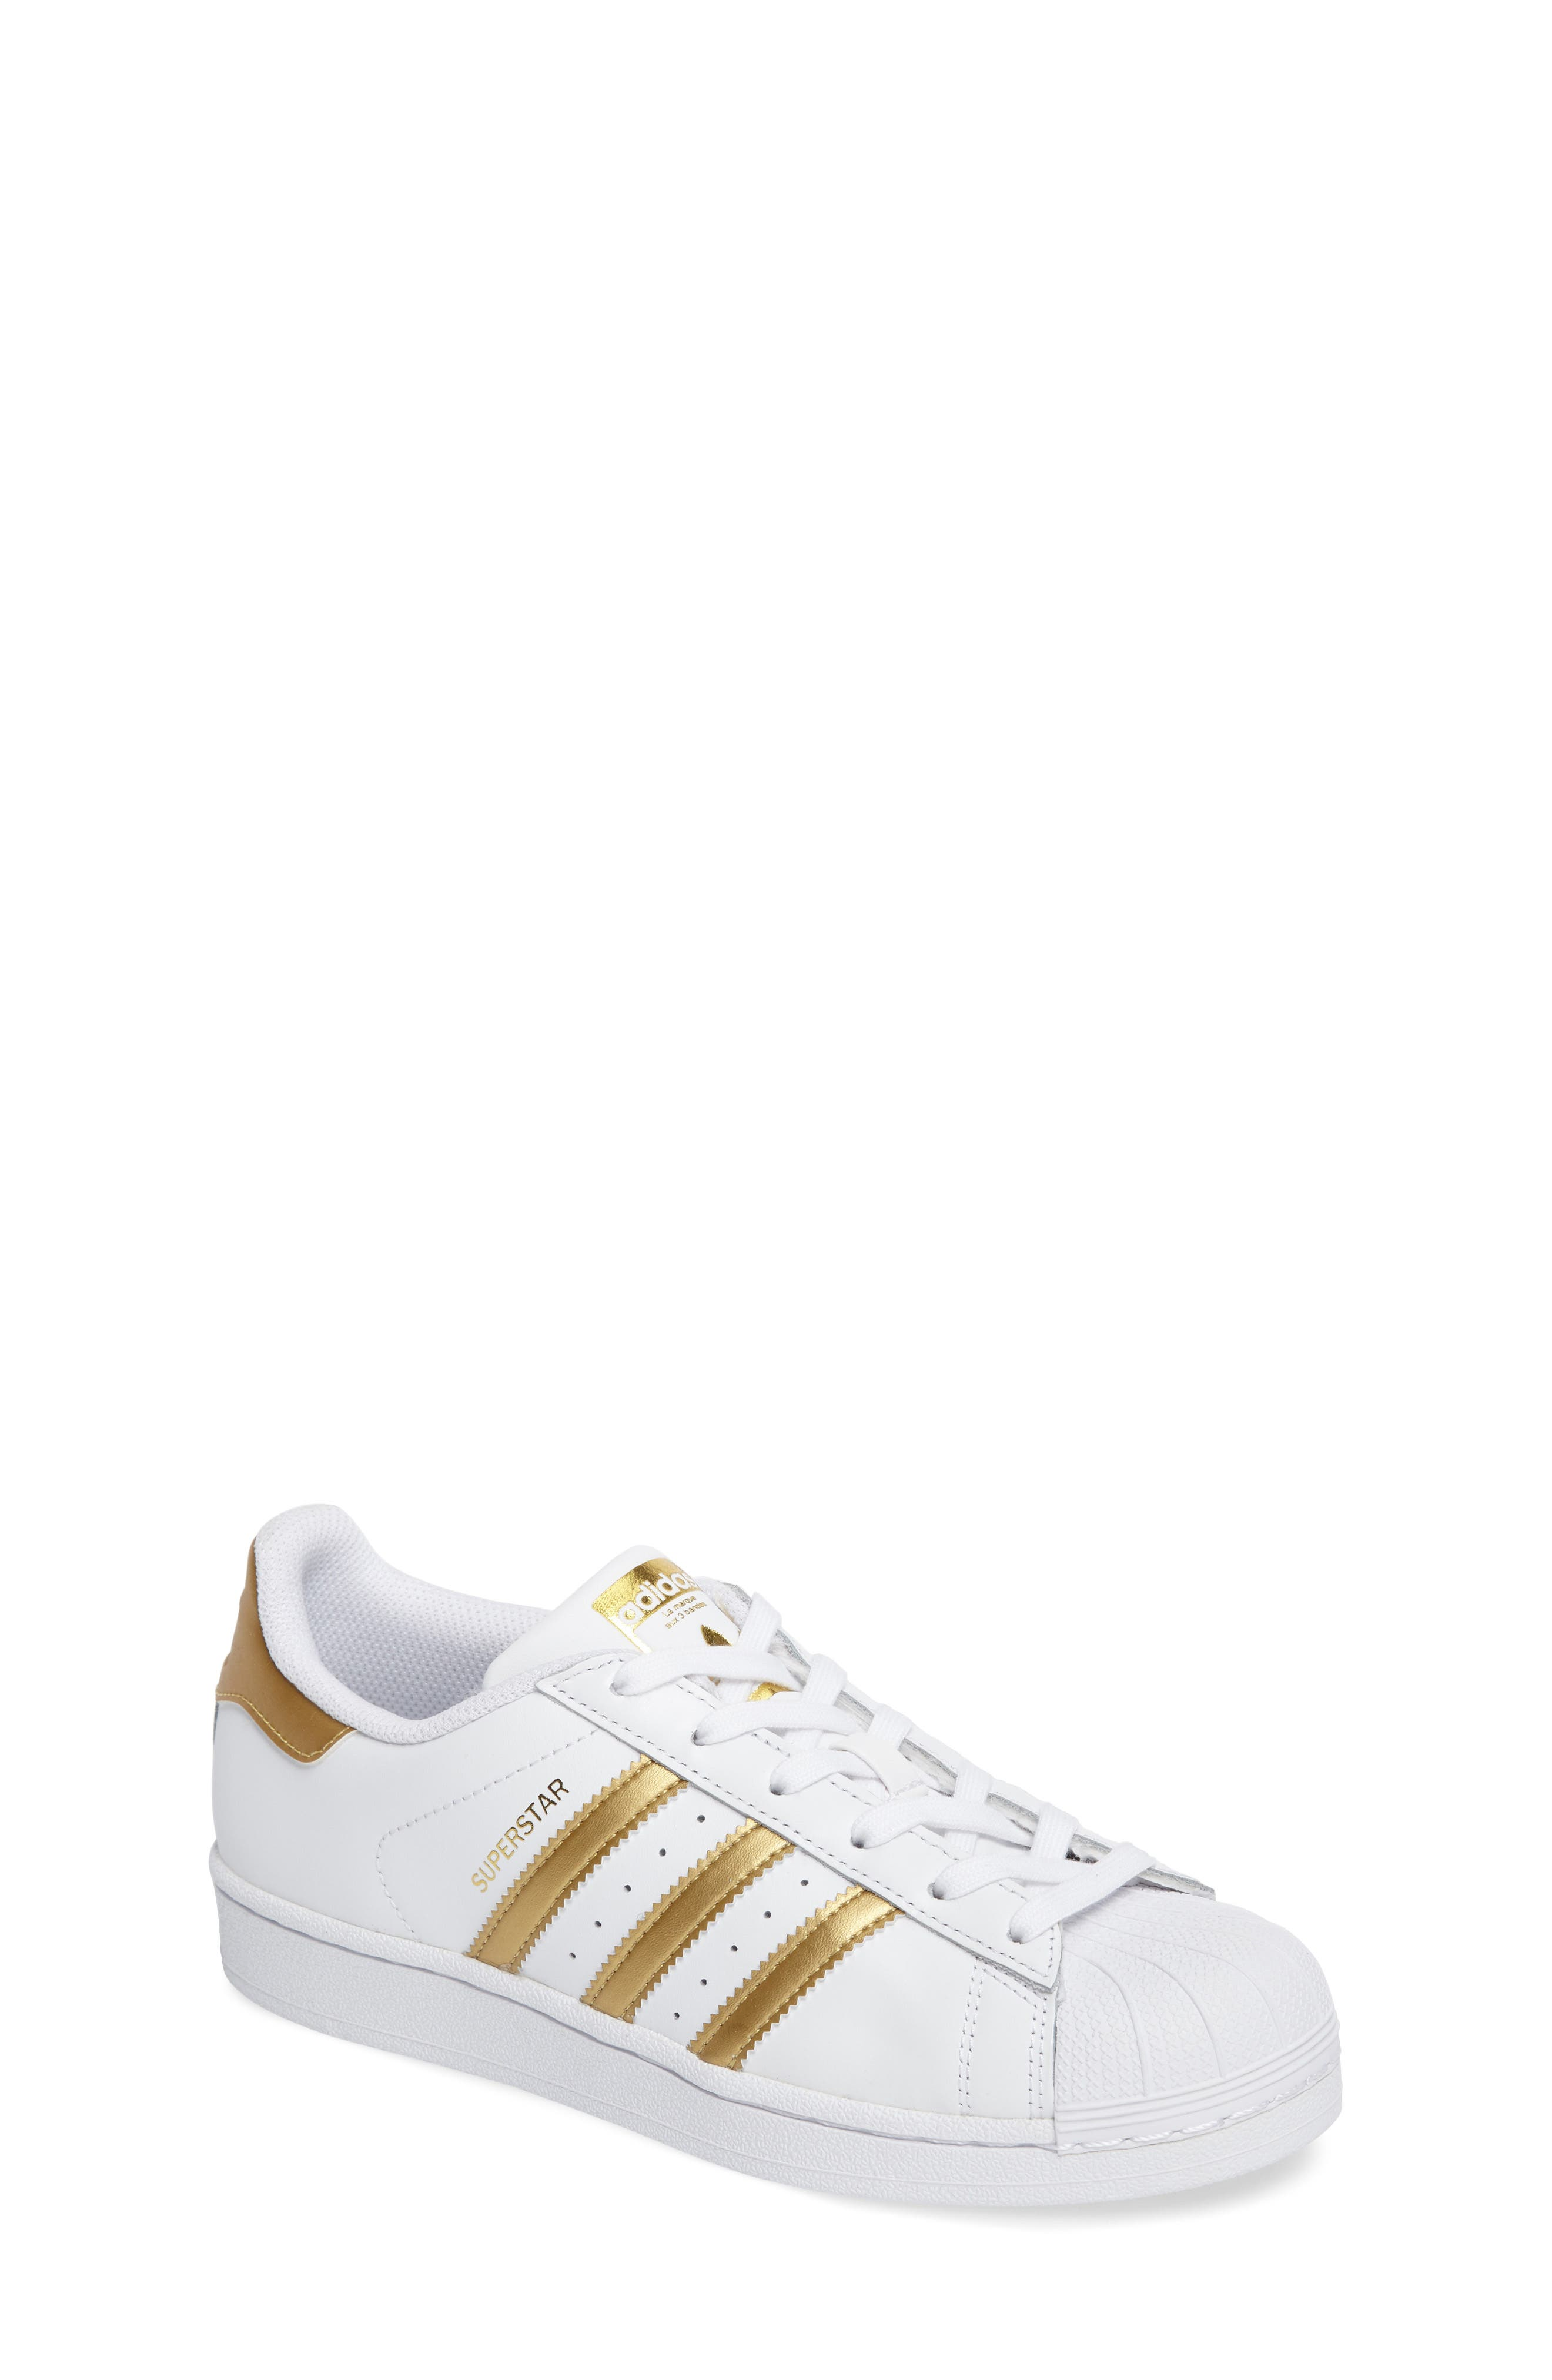 Main Image - adidas Superstar J Sneaker (Big Kid)